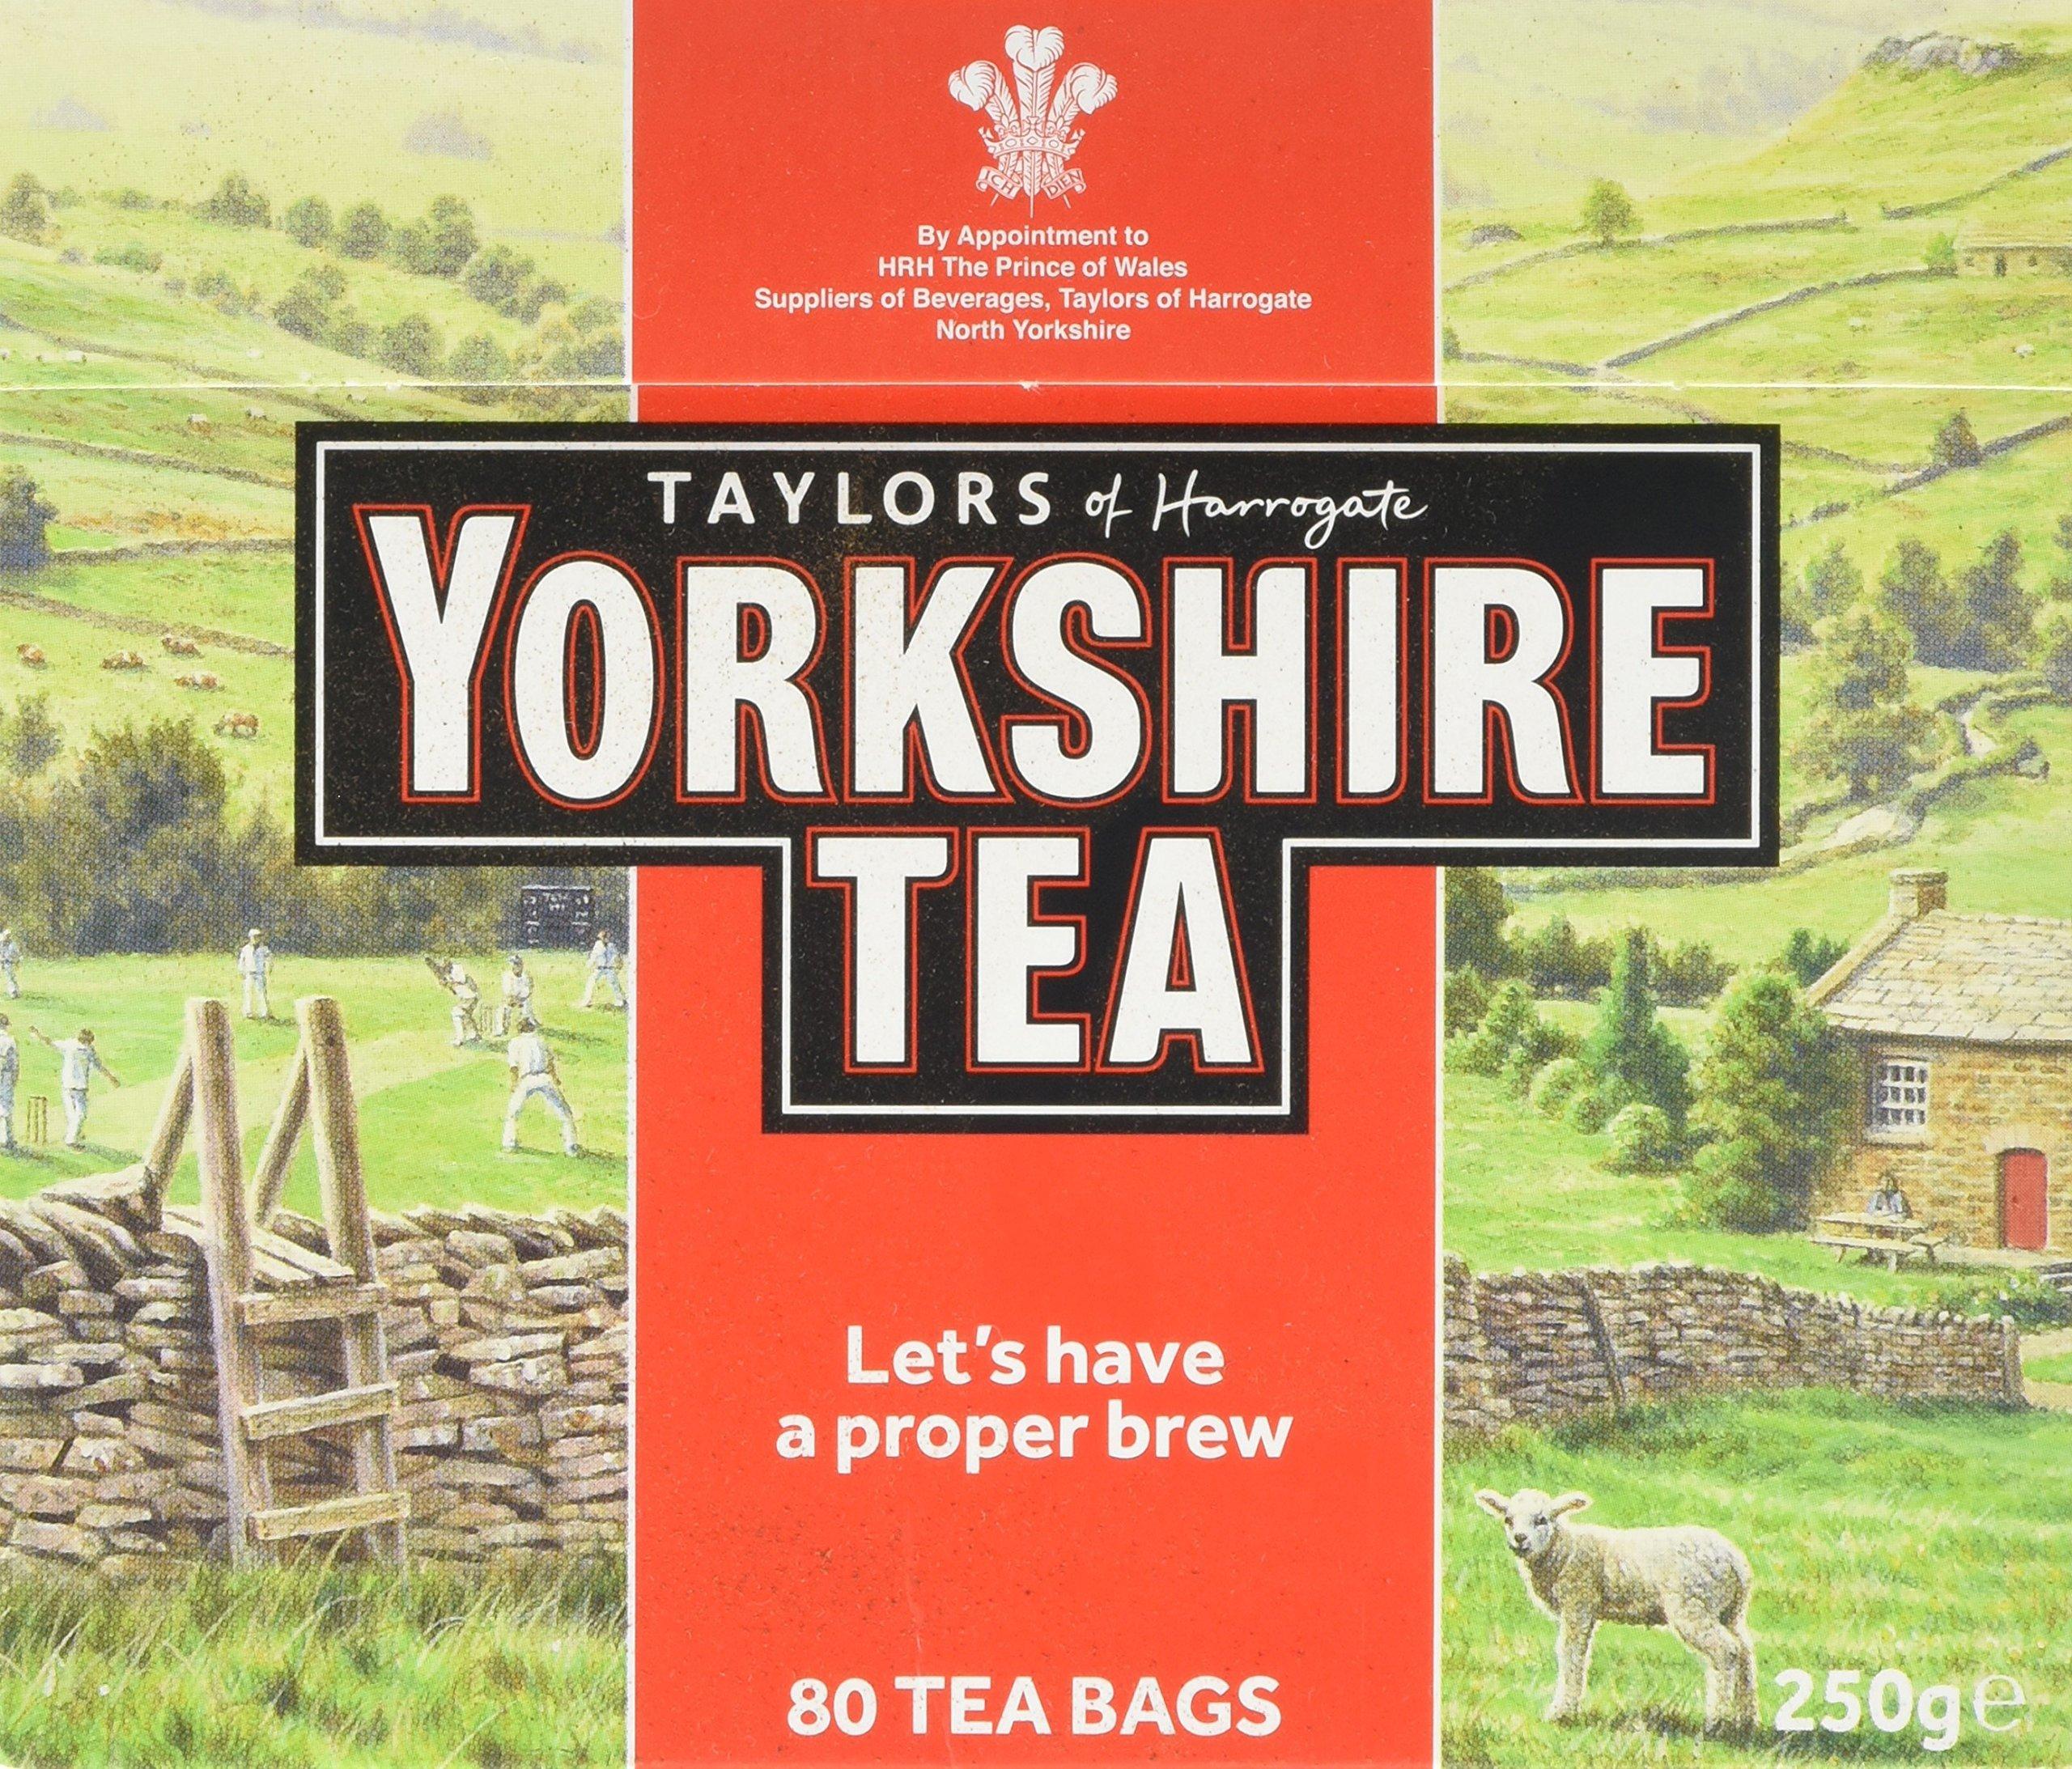 Taylors-of-Harrogate-Yorkshire-Tea-80-Btl-250g-Schwarzer-Tee